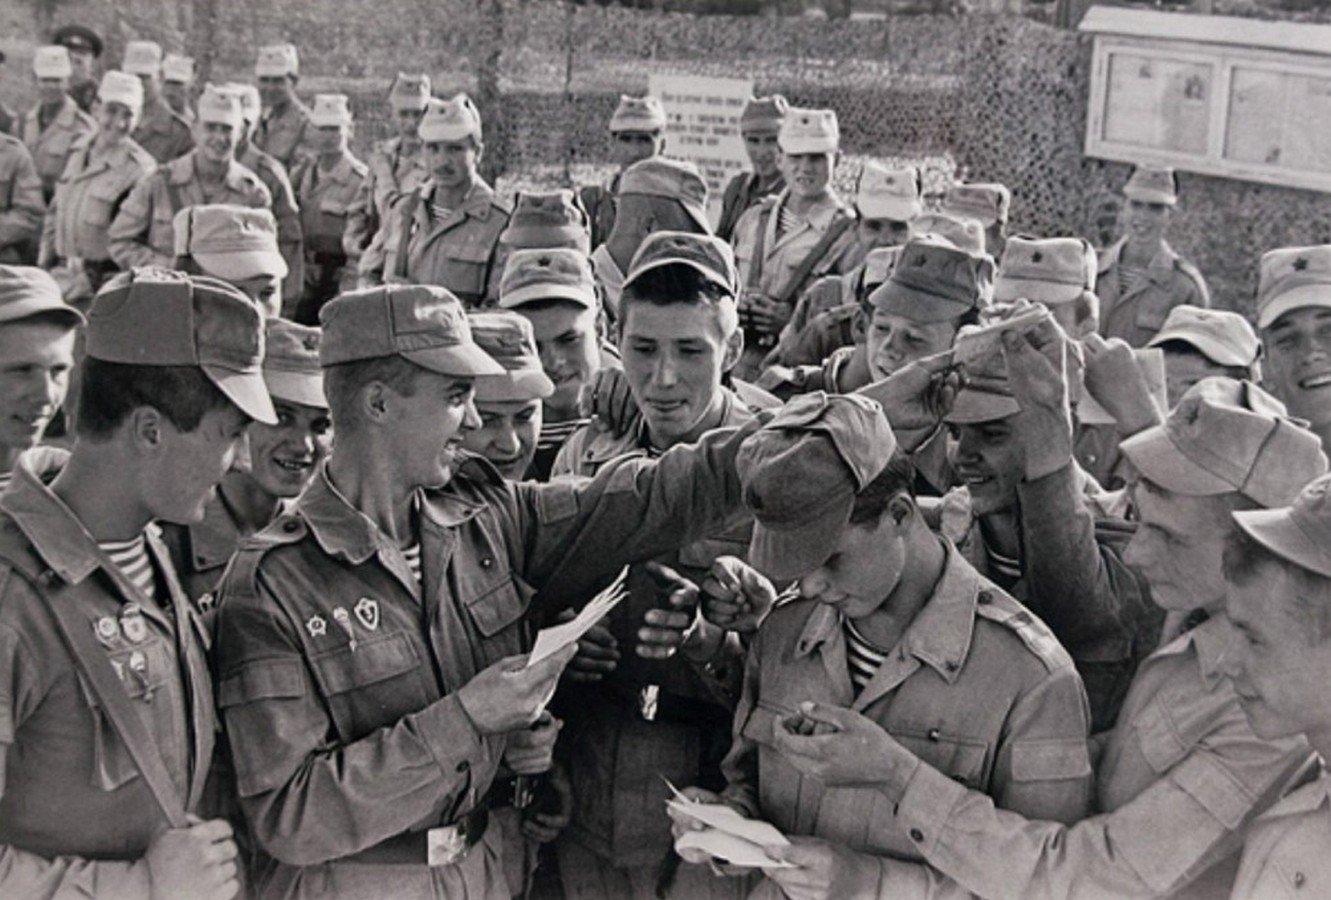 пропадает картинки солдат пишет письмо афганистан любая конфета